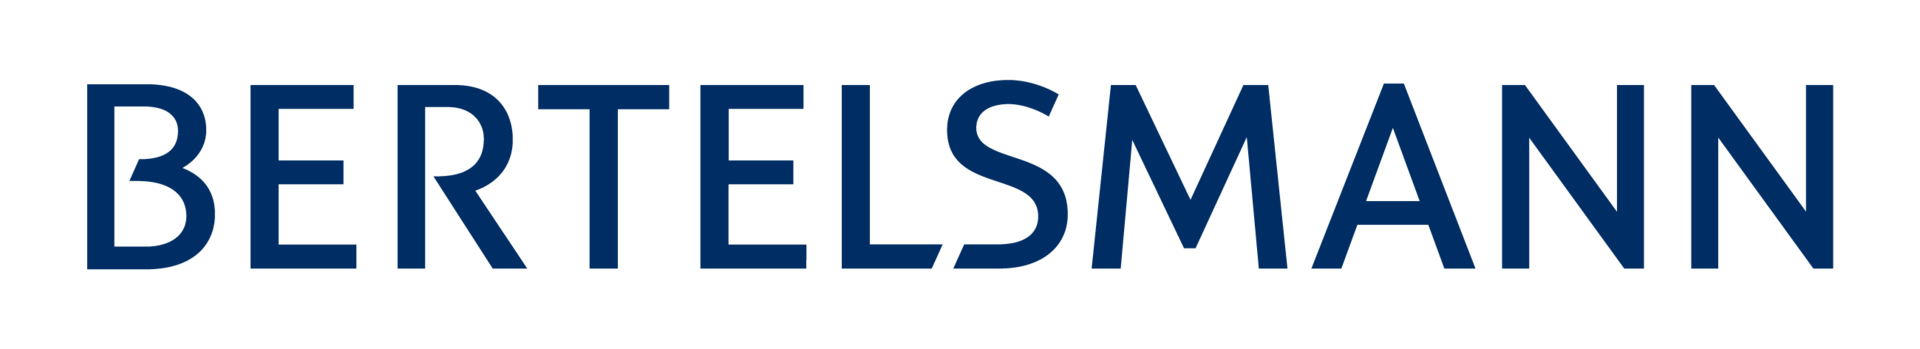 Bertelsmann-Logo (Quelle: Bertelsmann-Unternehmenskommunikation - CC BY 3.0), Bertelsmann